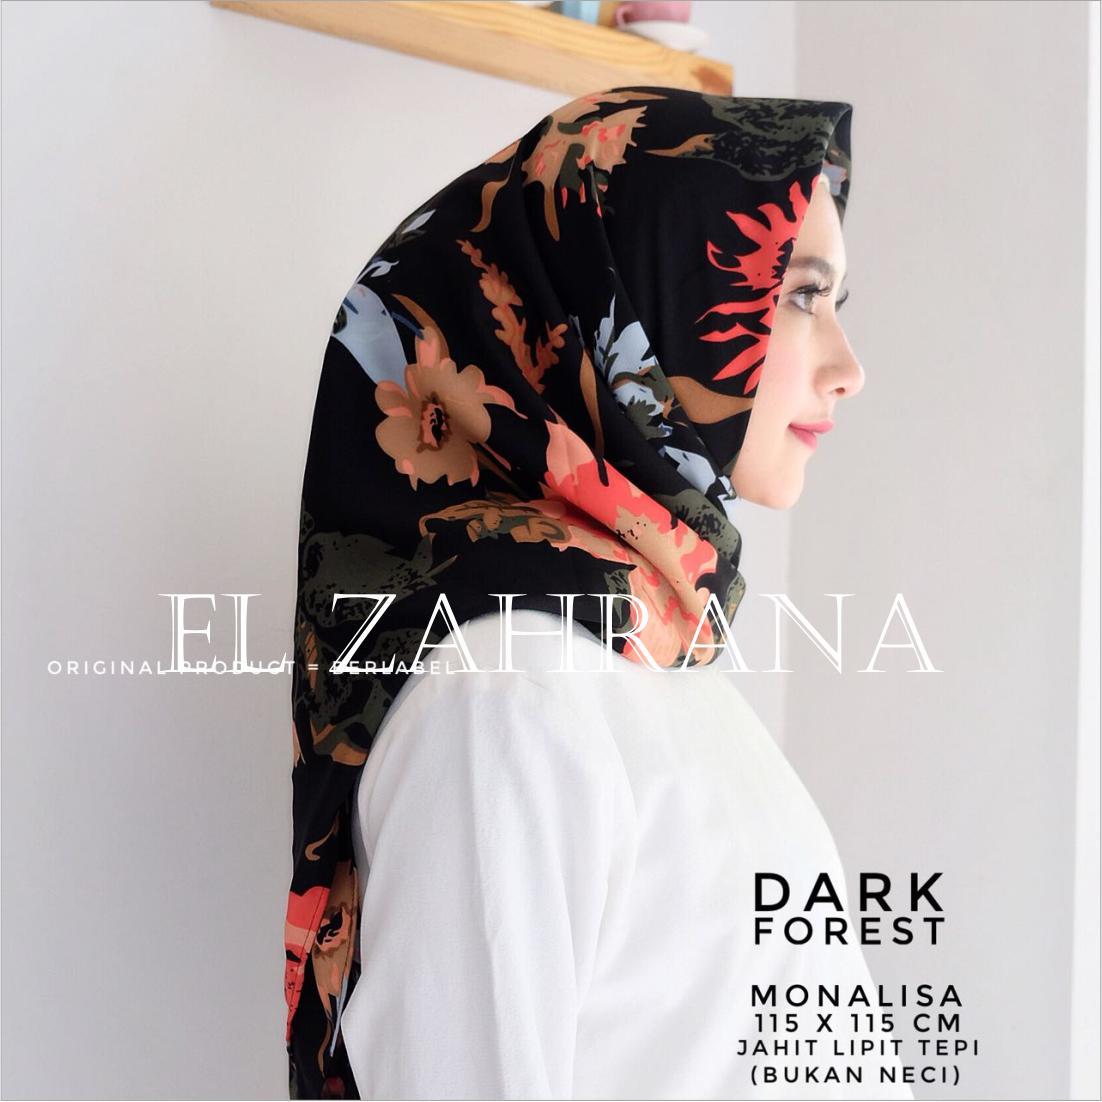 El Zahrana Hijab Square - Kerudung Segi Empat - Jilbab Segi Empat - Jilbab Motif Premium Monalisa